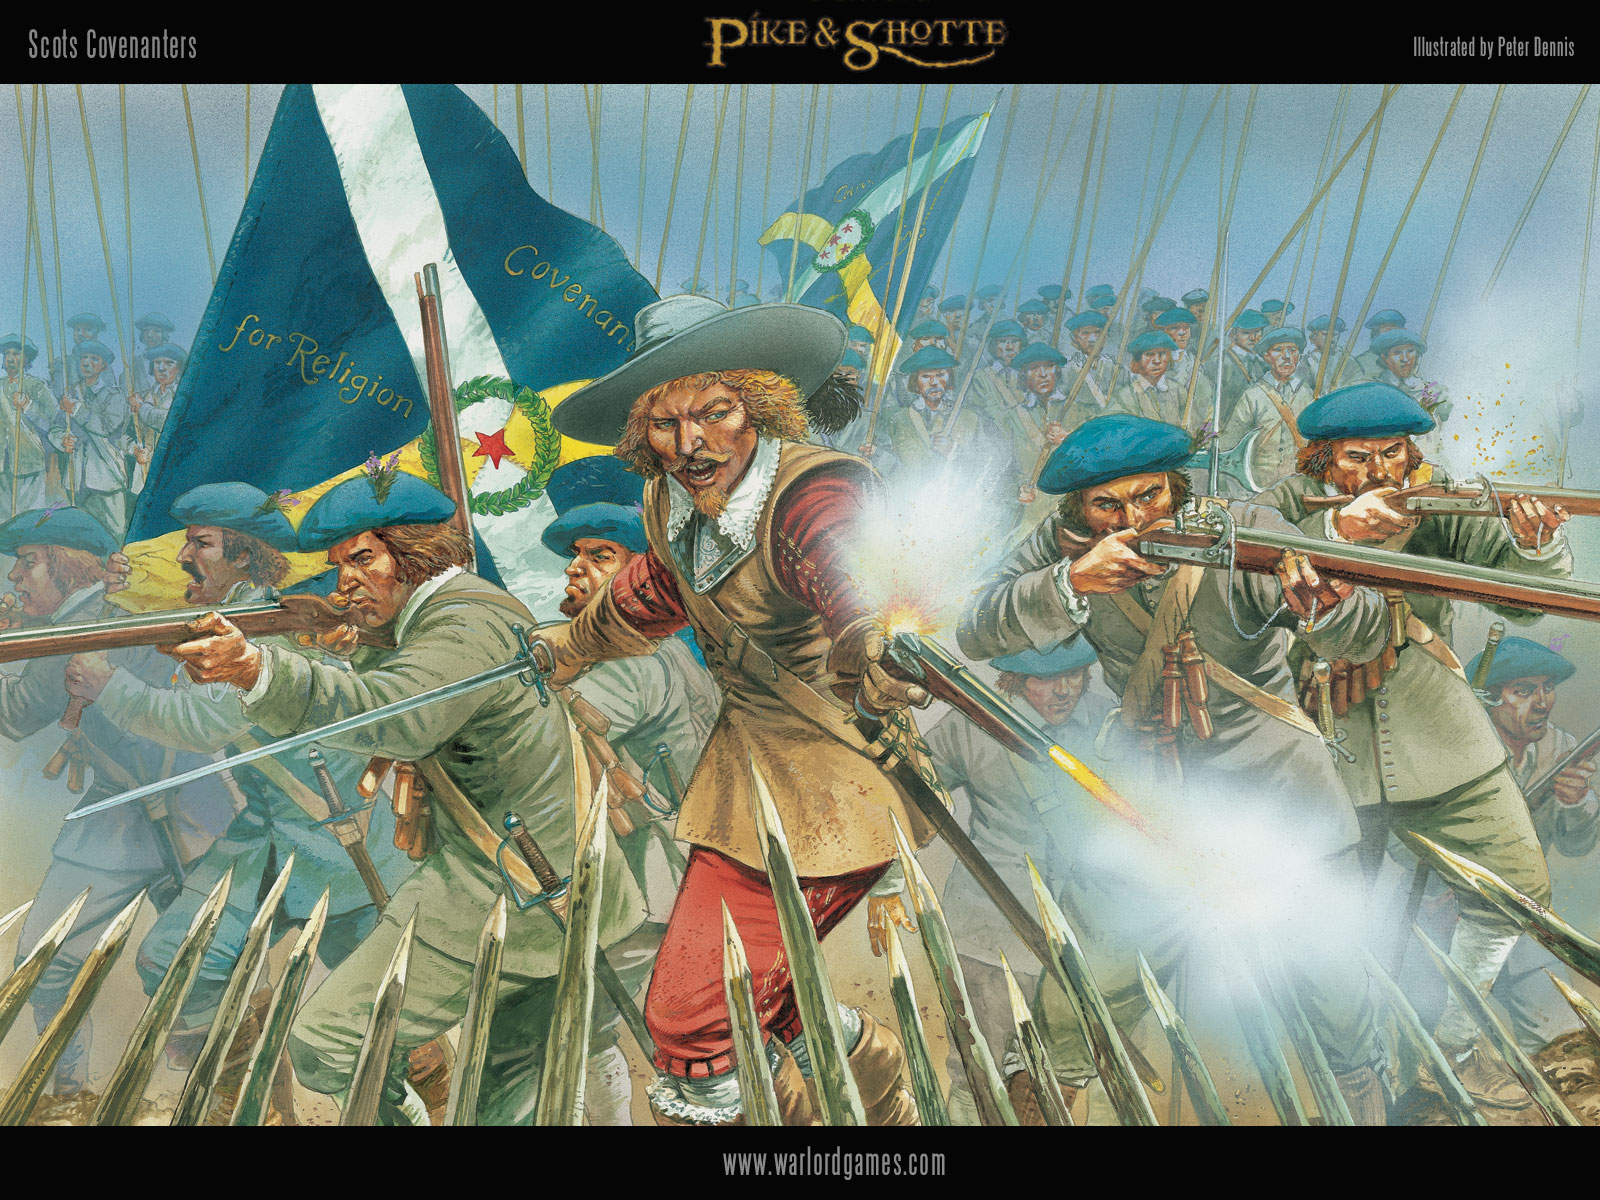 Illustrations P&S Covenanter-wallpaper